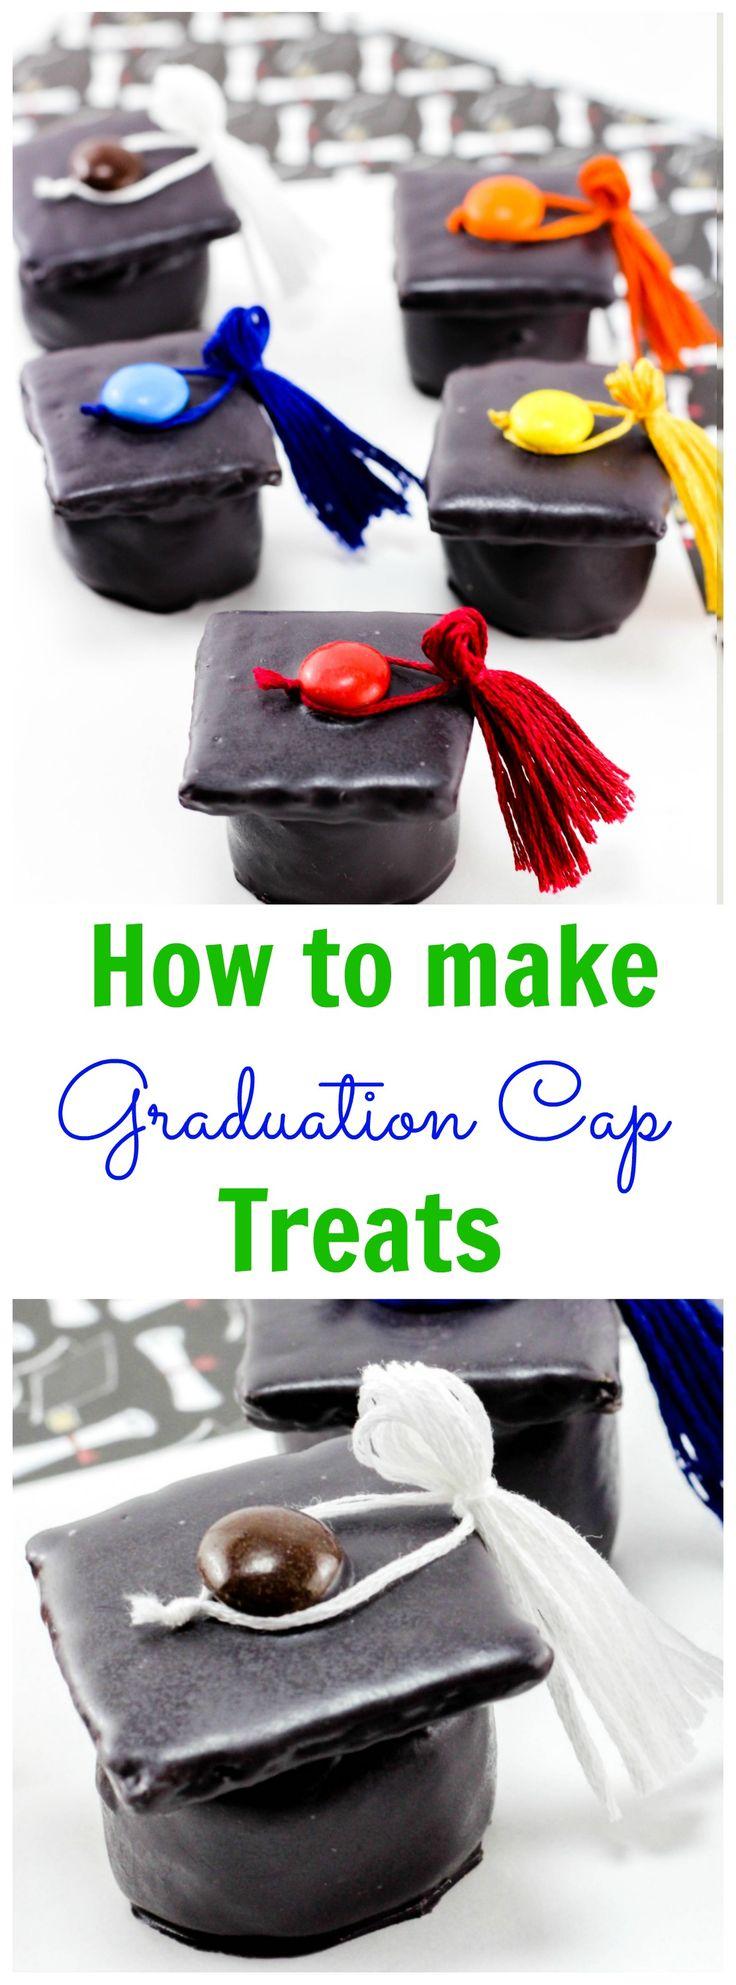 Kindergarten Graduation Treat Ideas - Graduation Cap Treats